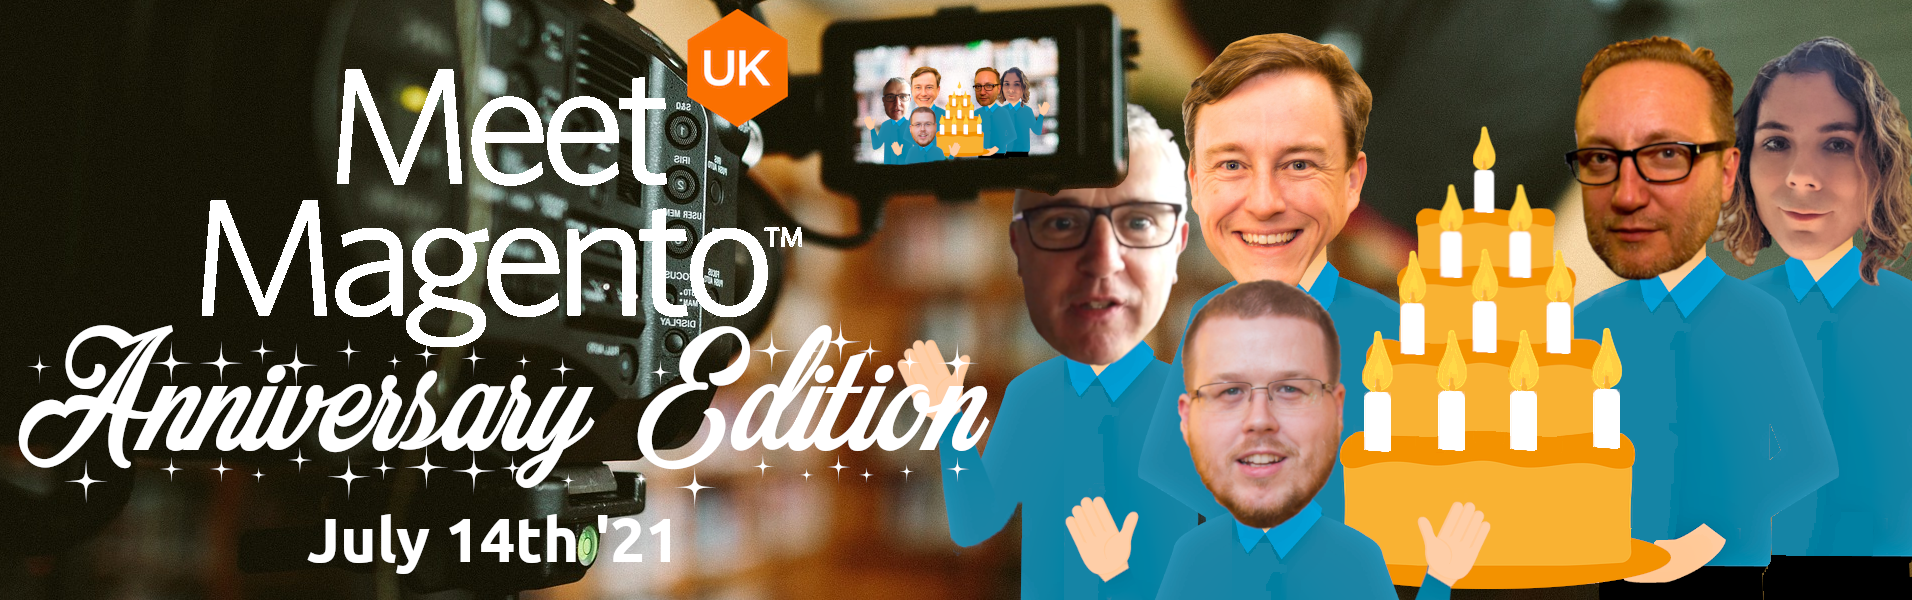 Meet Magento UK '21 - Eric Erway, Penny McLachlan, Paul Skeldon, Jamie Huskisson & Brian Green.